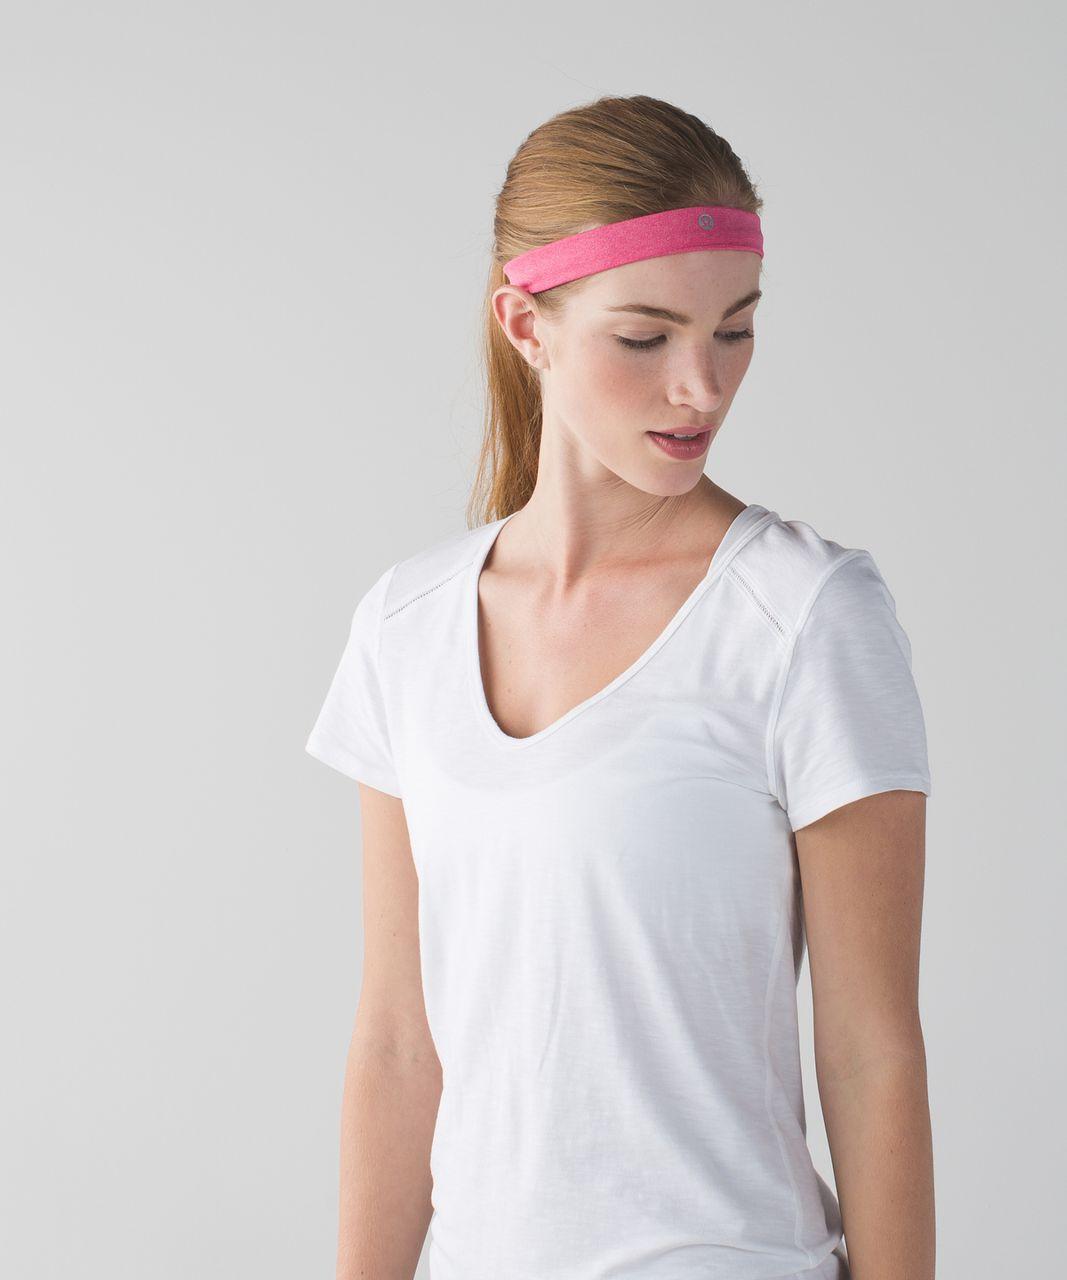 Lululemon Cardio Cross Trainer Headband - Heathered Bon Bon